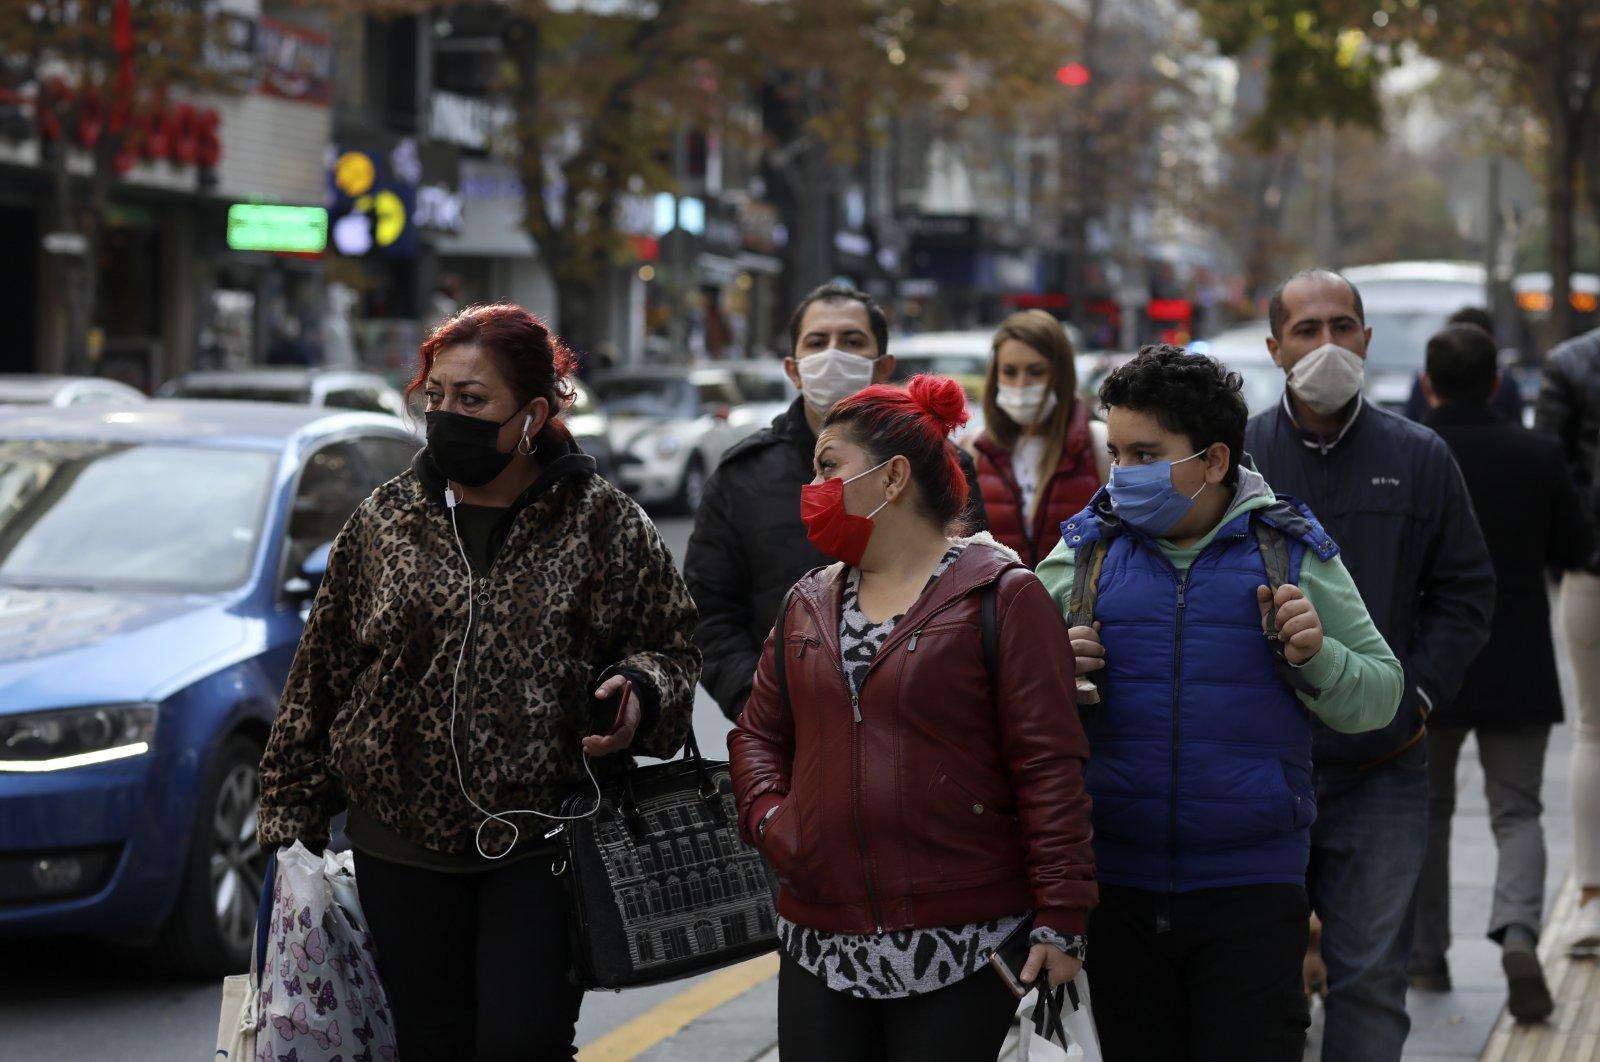 People wearing protective masks walk on a street in the capital Ankara, Turkey, Nov. 30, 2020. (AP Photo)